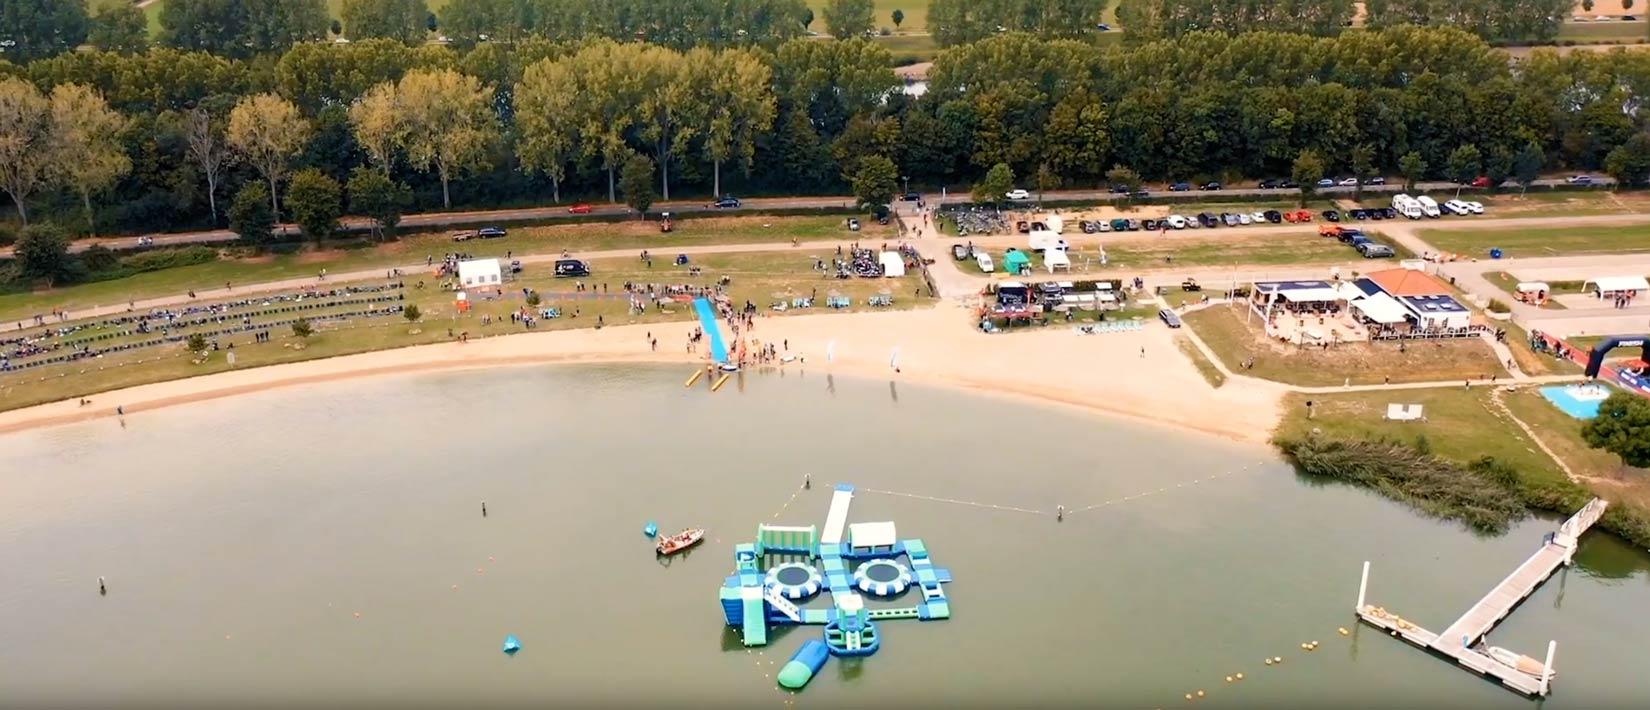 Roermond_City_Triathlon-Area_X_Roermond-foto-drone-foto1